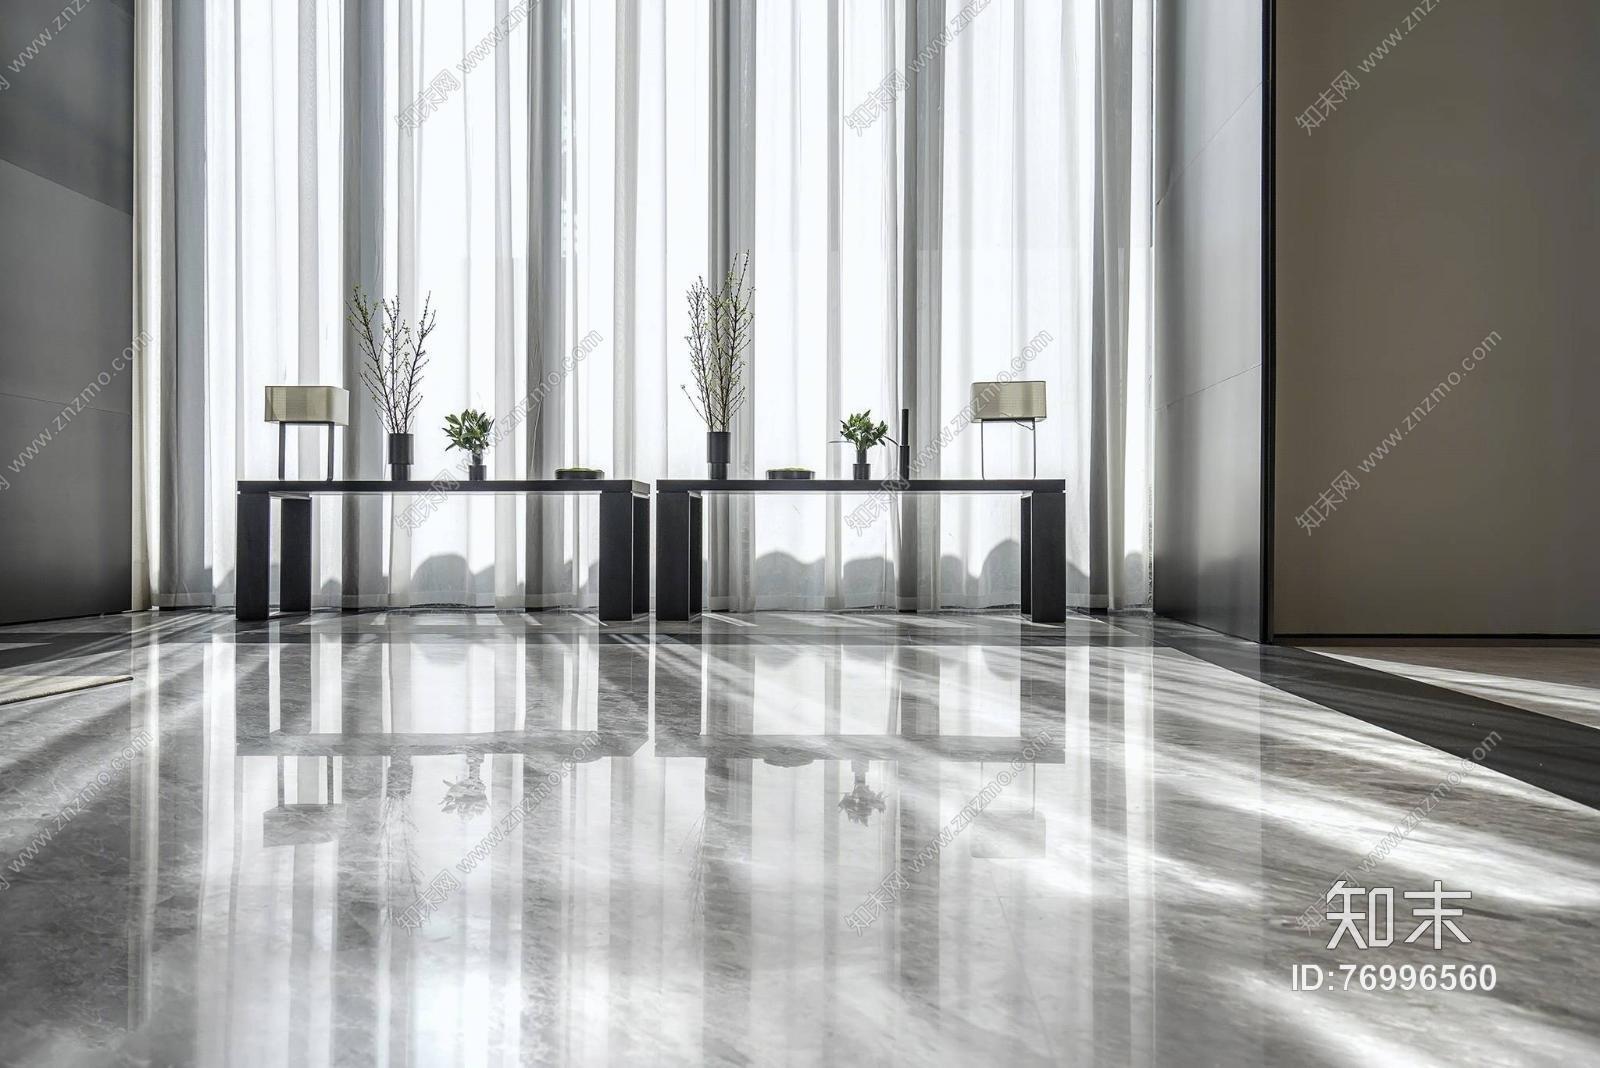 【SCDA】华润展示中心设计方案&施工图&物料表141M施工图下载【ID:76996560】